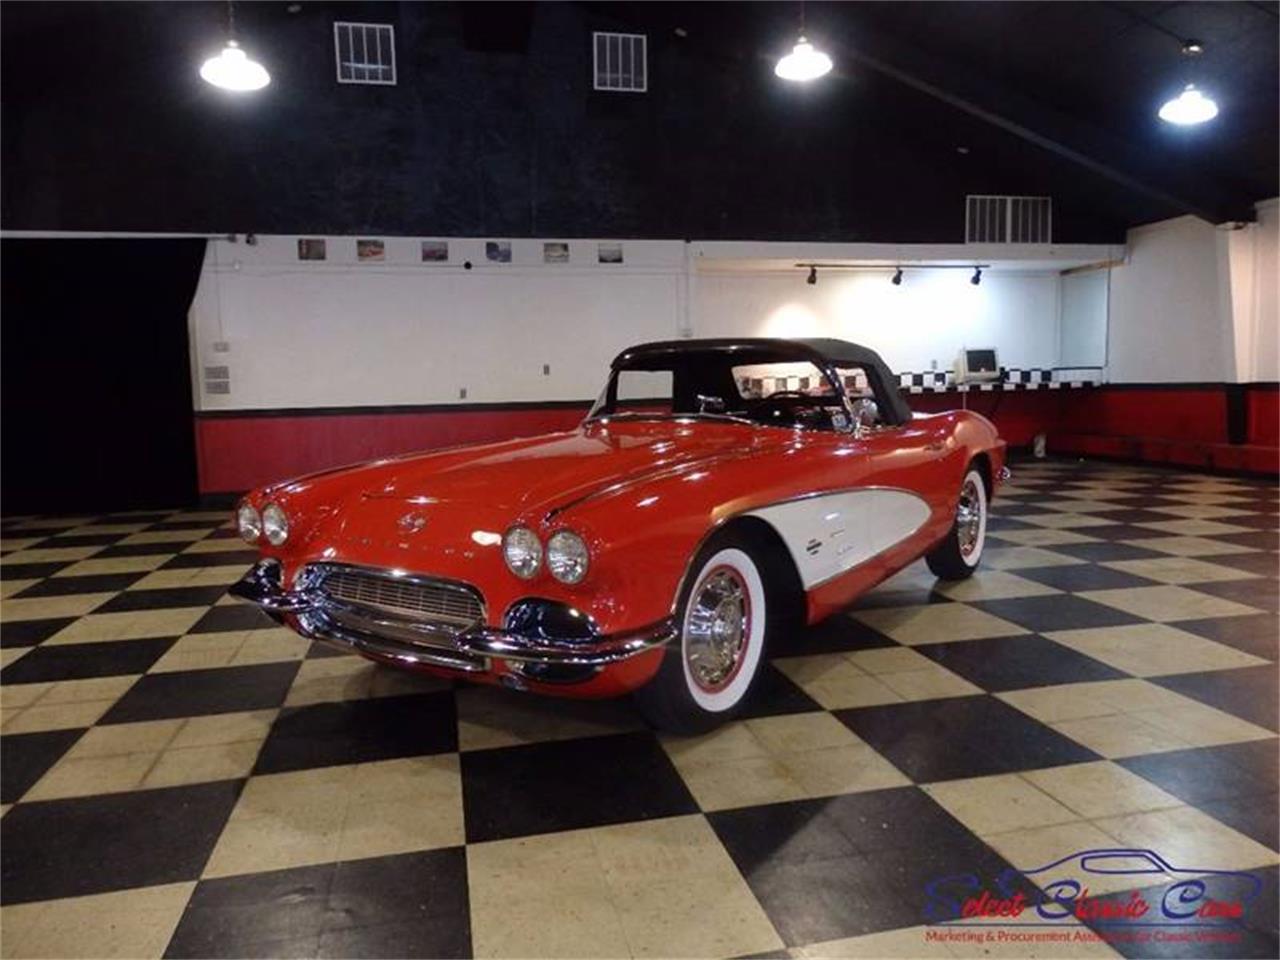 Large Picture of '61 Corvette located in Hiram Georgia - $69,500.00 - L521